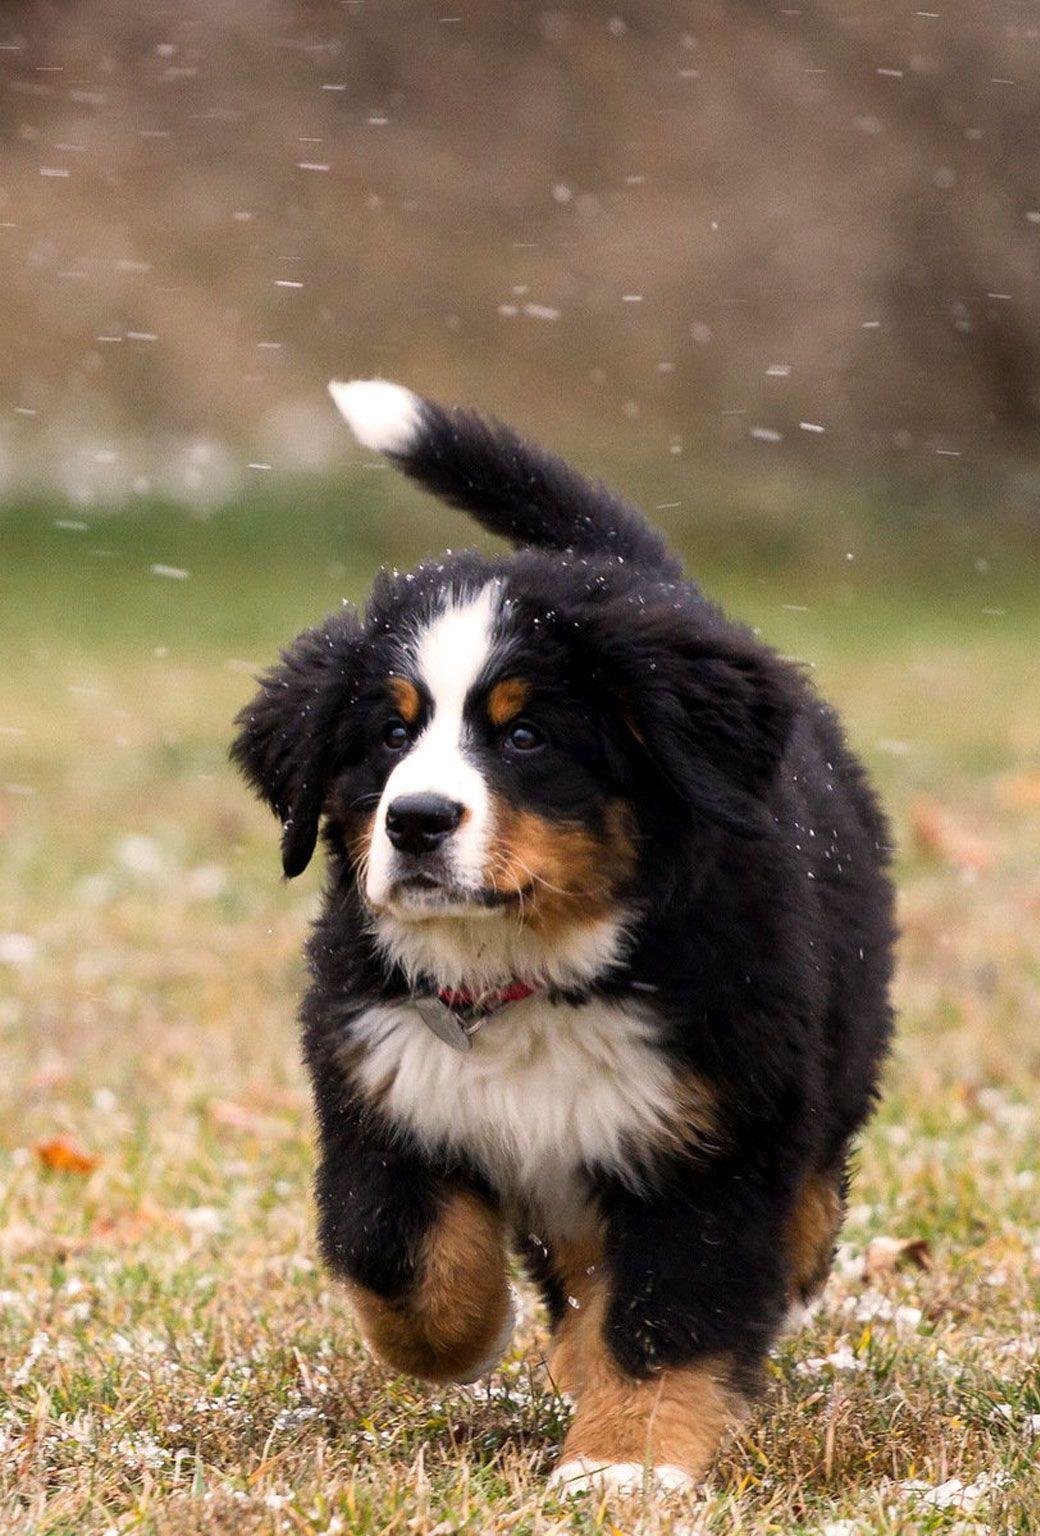 Pinterest Catherinesullivan2017 Best Puppies Puppies Dogs And Puppies